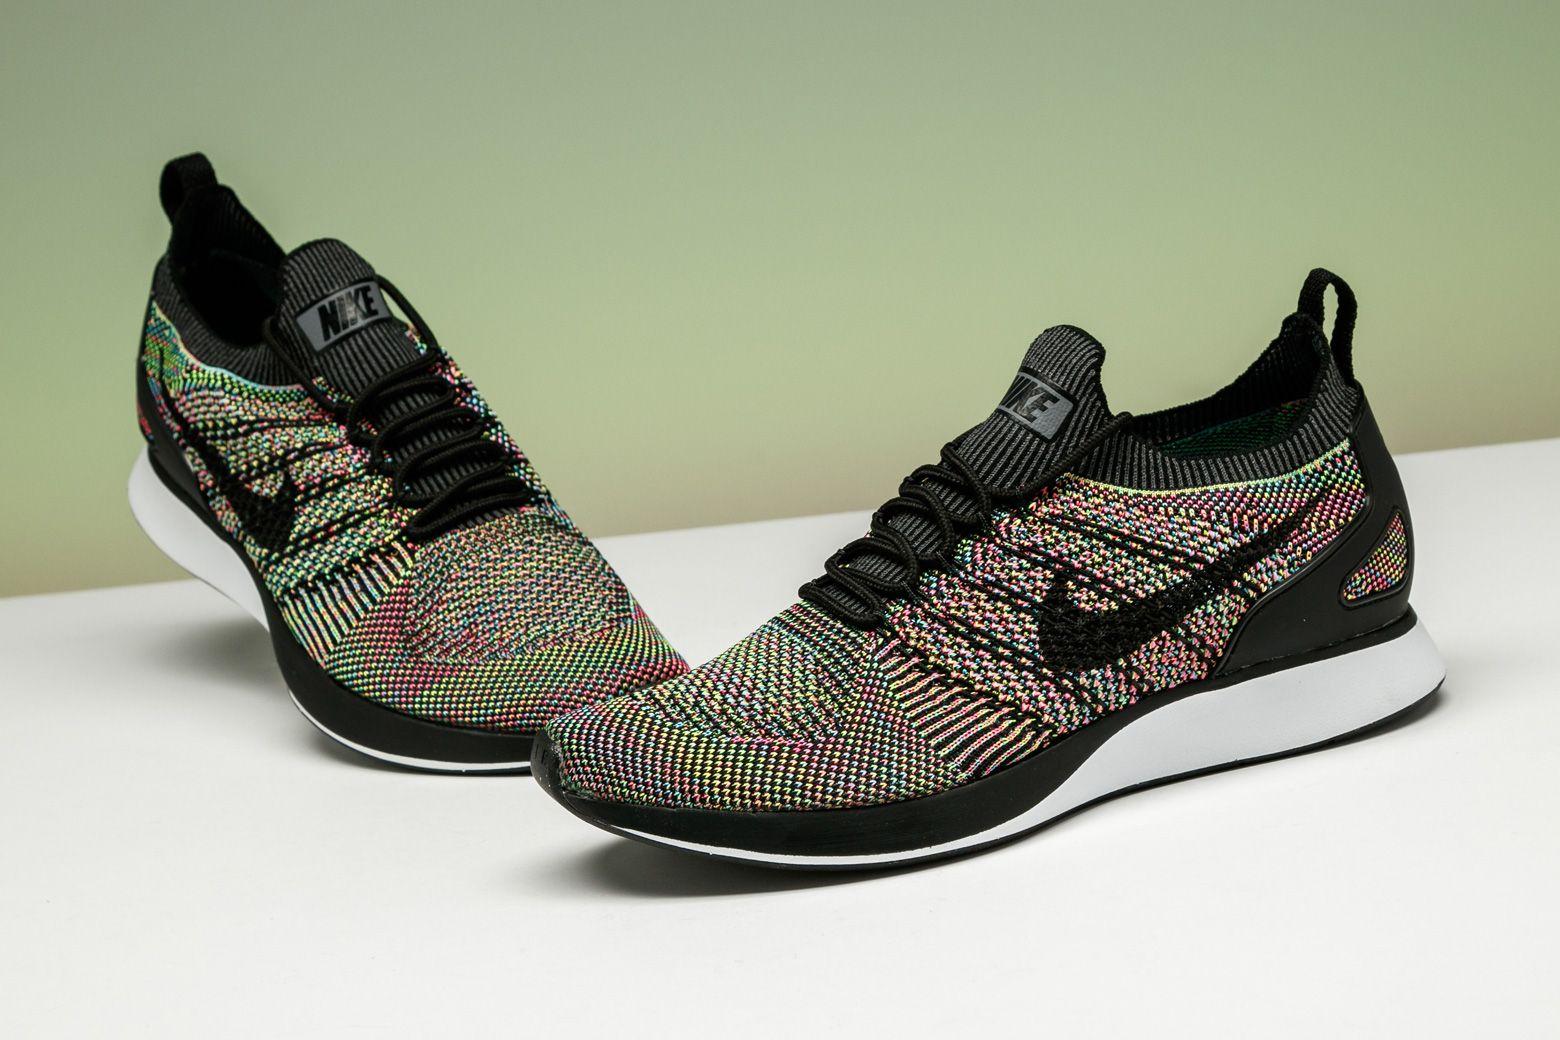 Nike Air Zoom Mariah Flyknit Racer 918264 101 | Flyknit